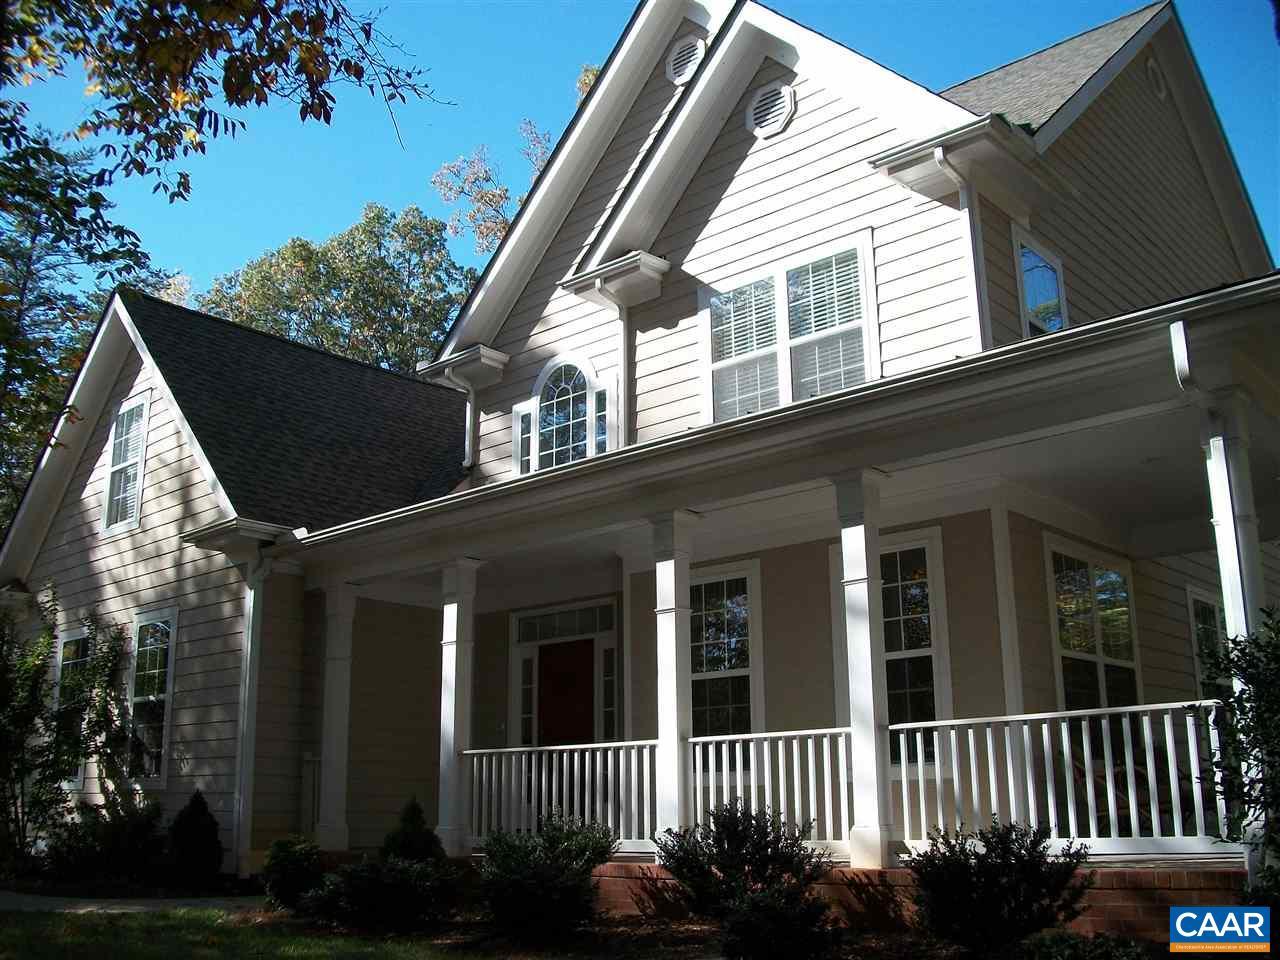 Single Family Home for Sale at 4235 WOOD THRUSH Lane 4235 WOOD THRUSH Lane Barboursville, Virginia 22923 United States